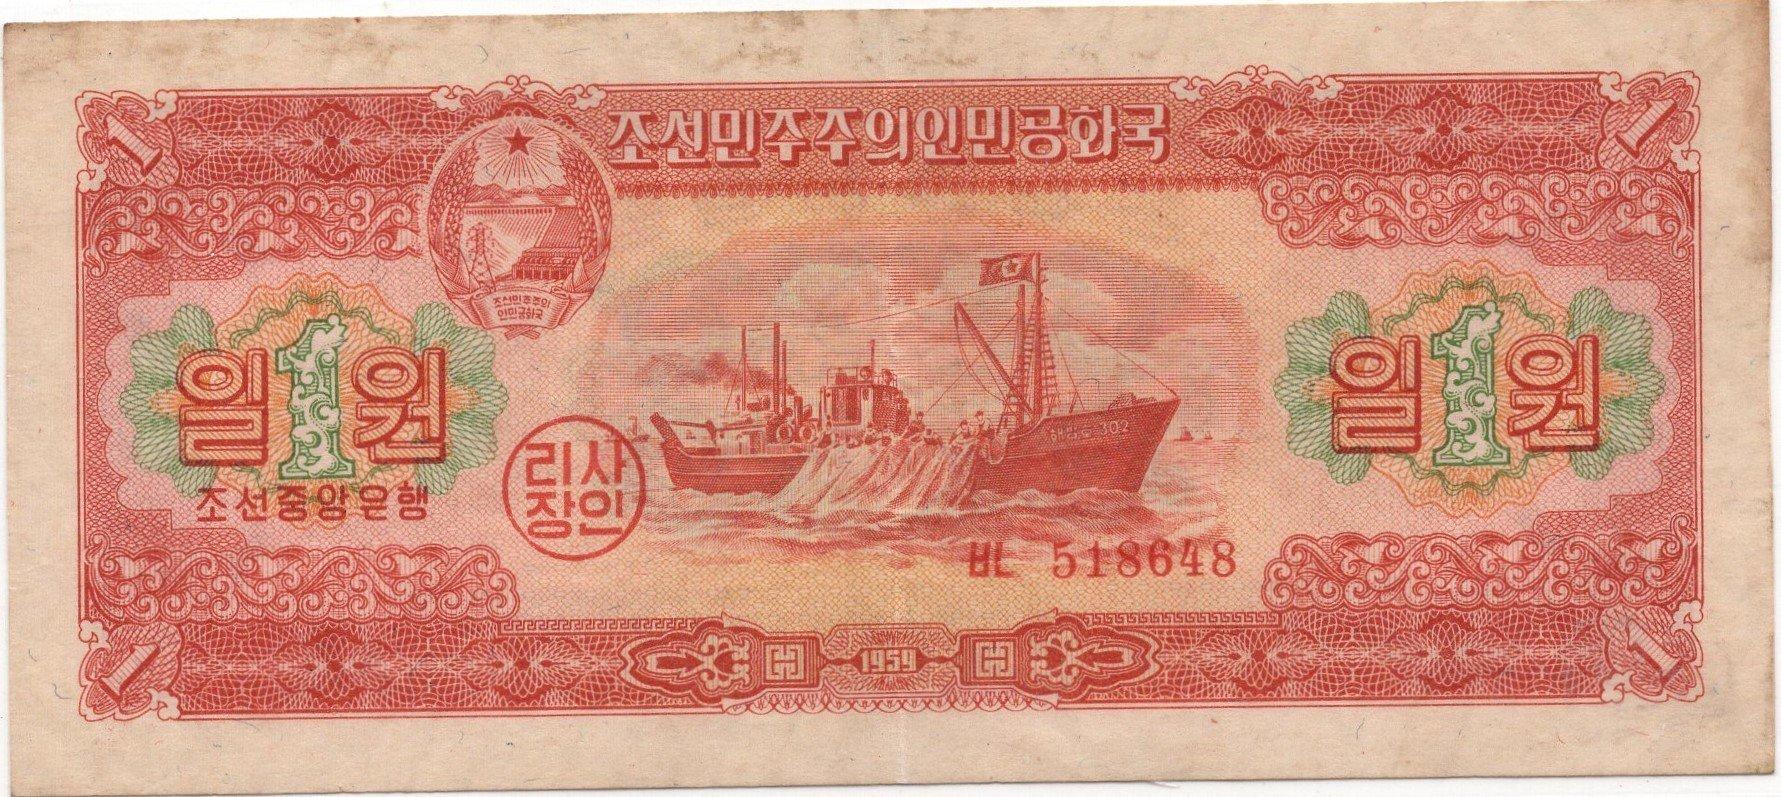 North korea 1 won 1959 banknote for sale